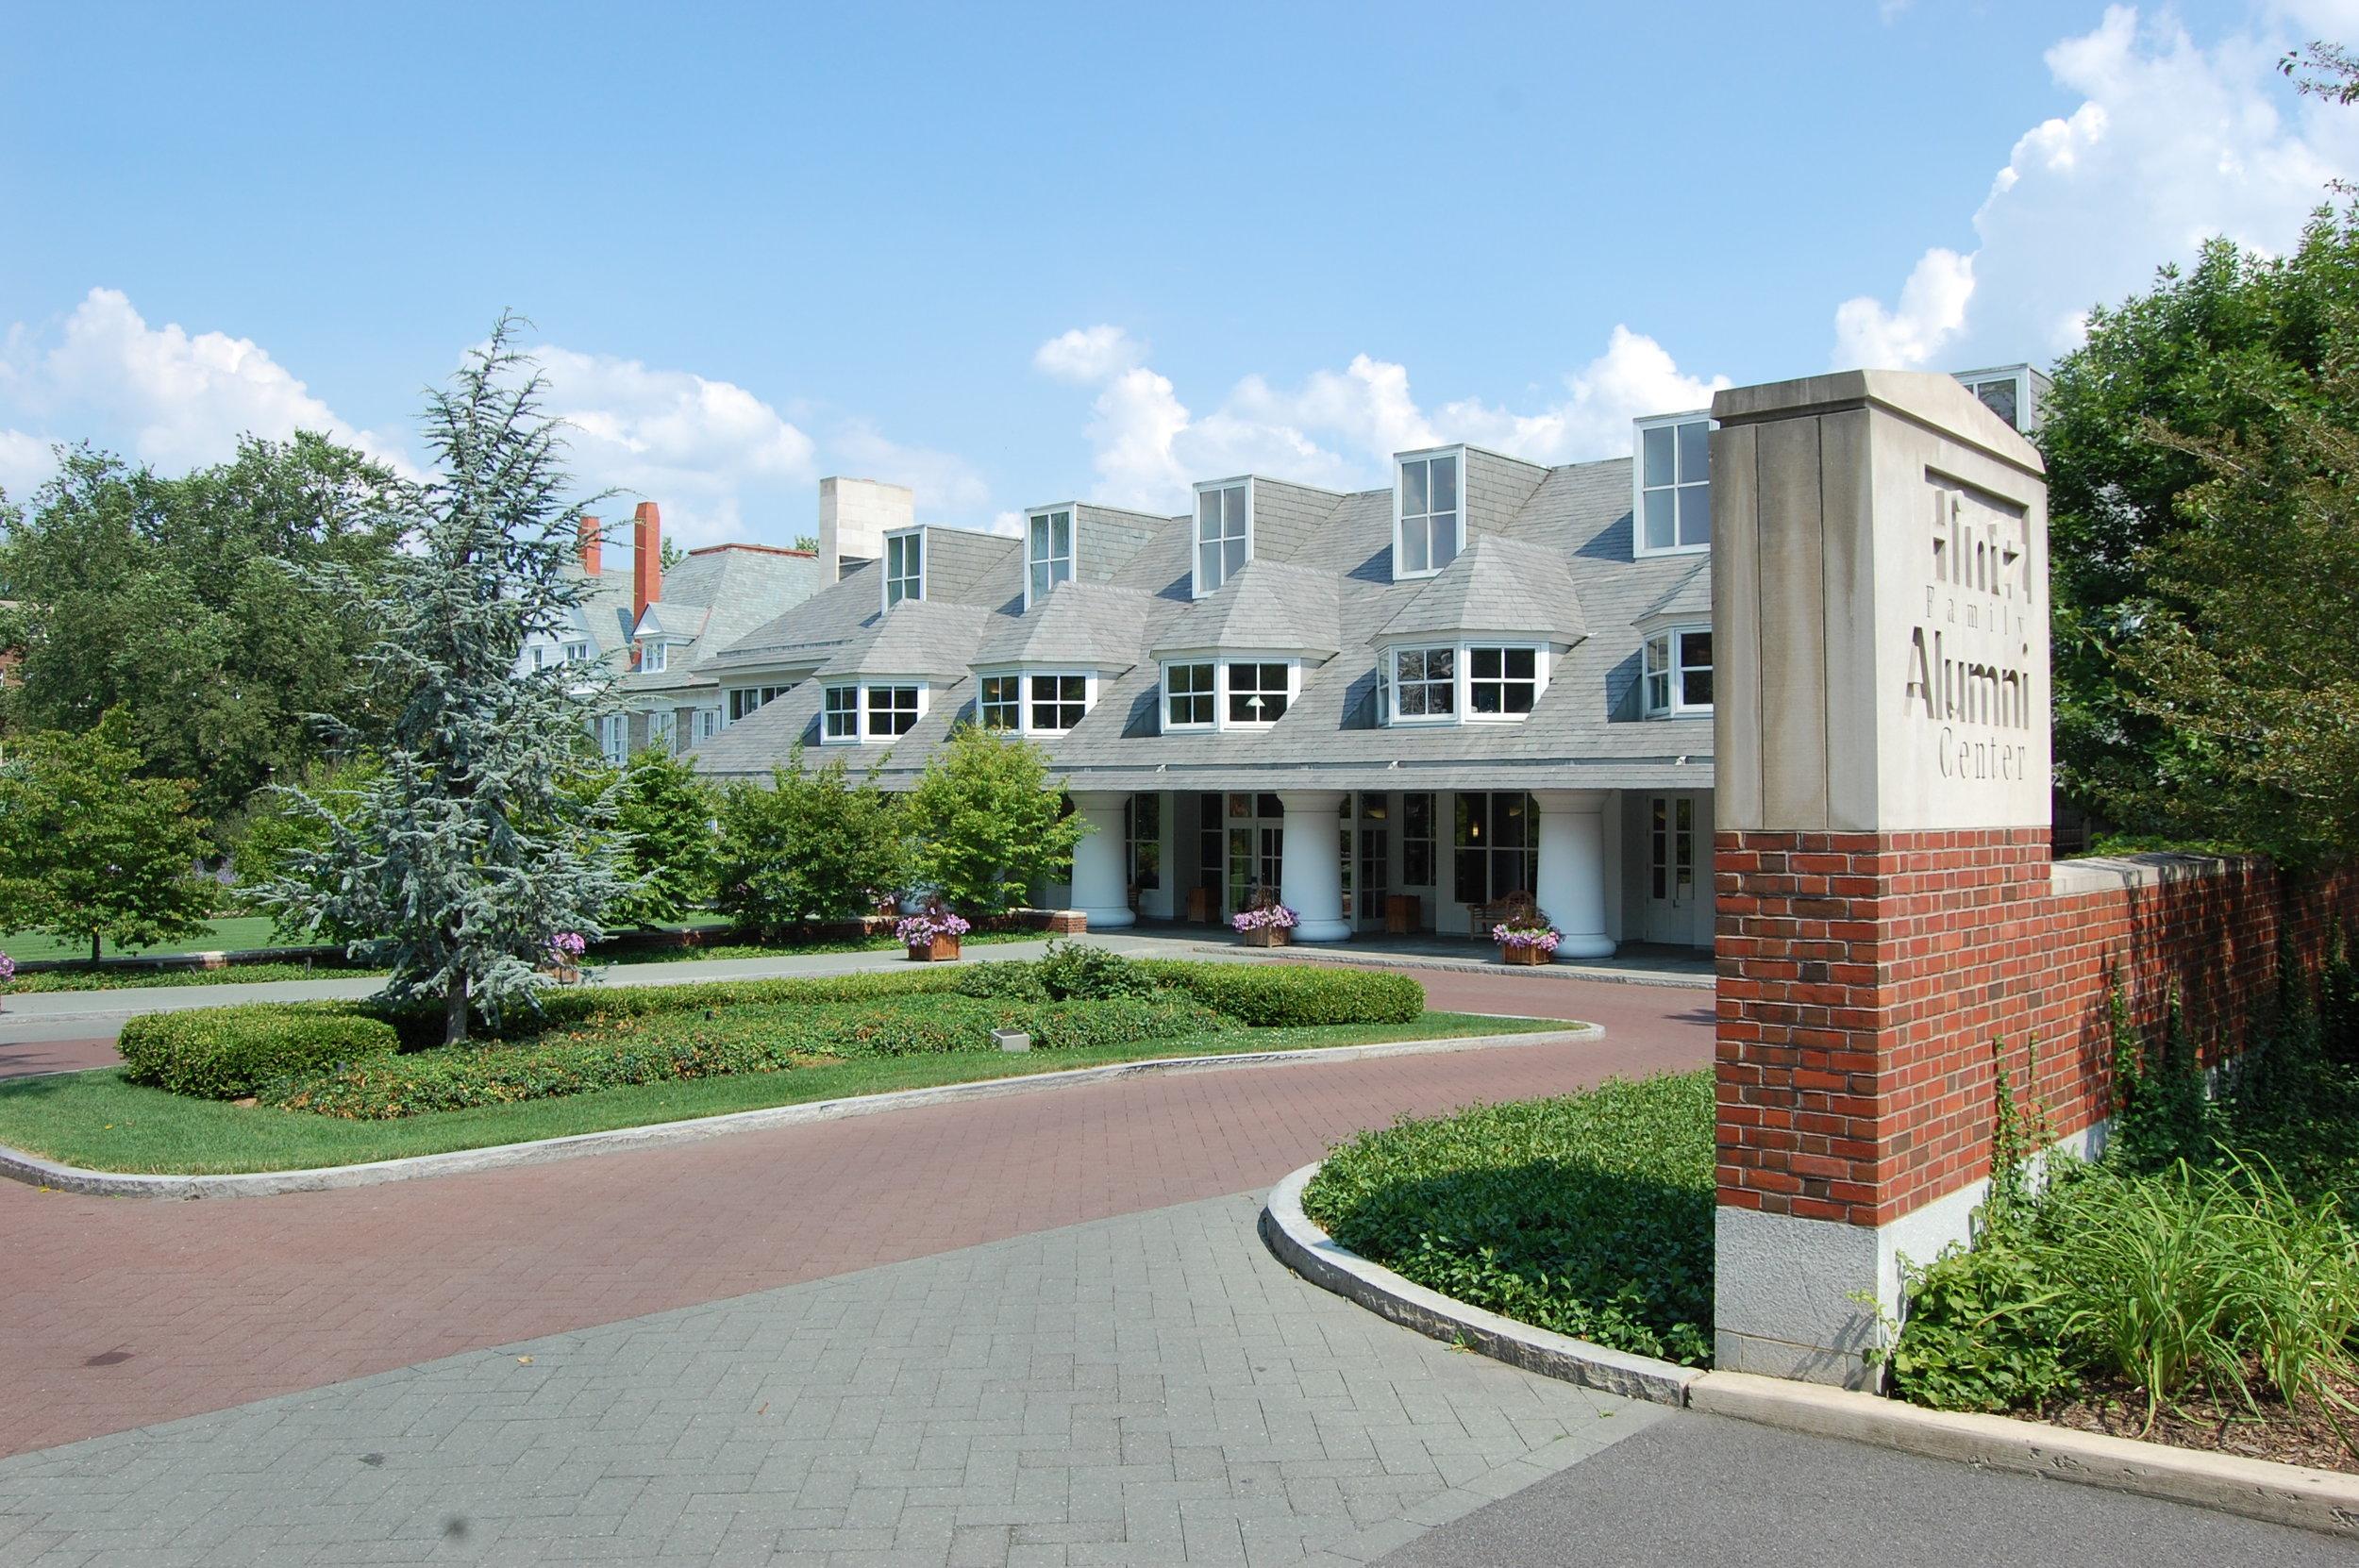 Alumni Center Asphalt Pavers 052.jpg